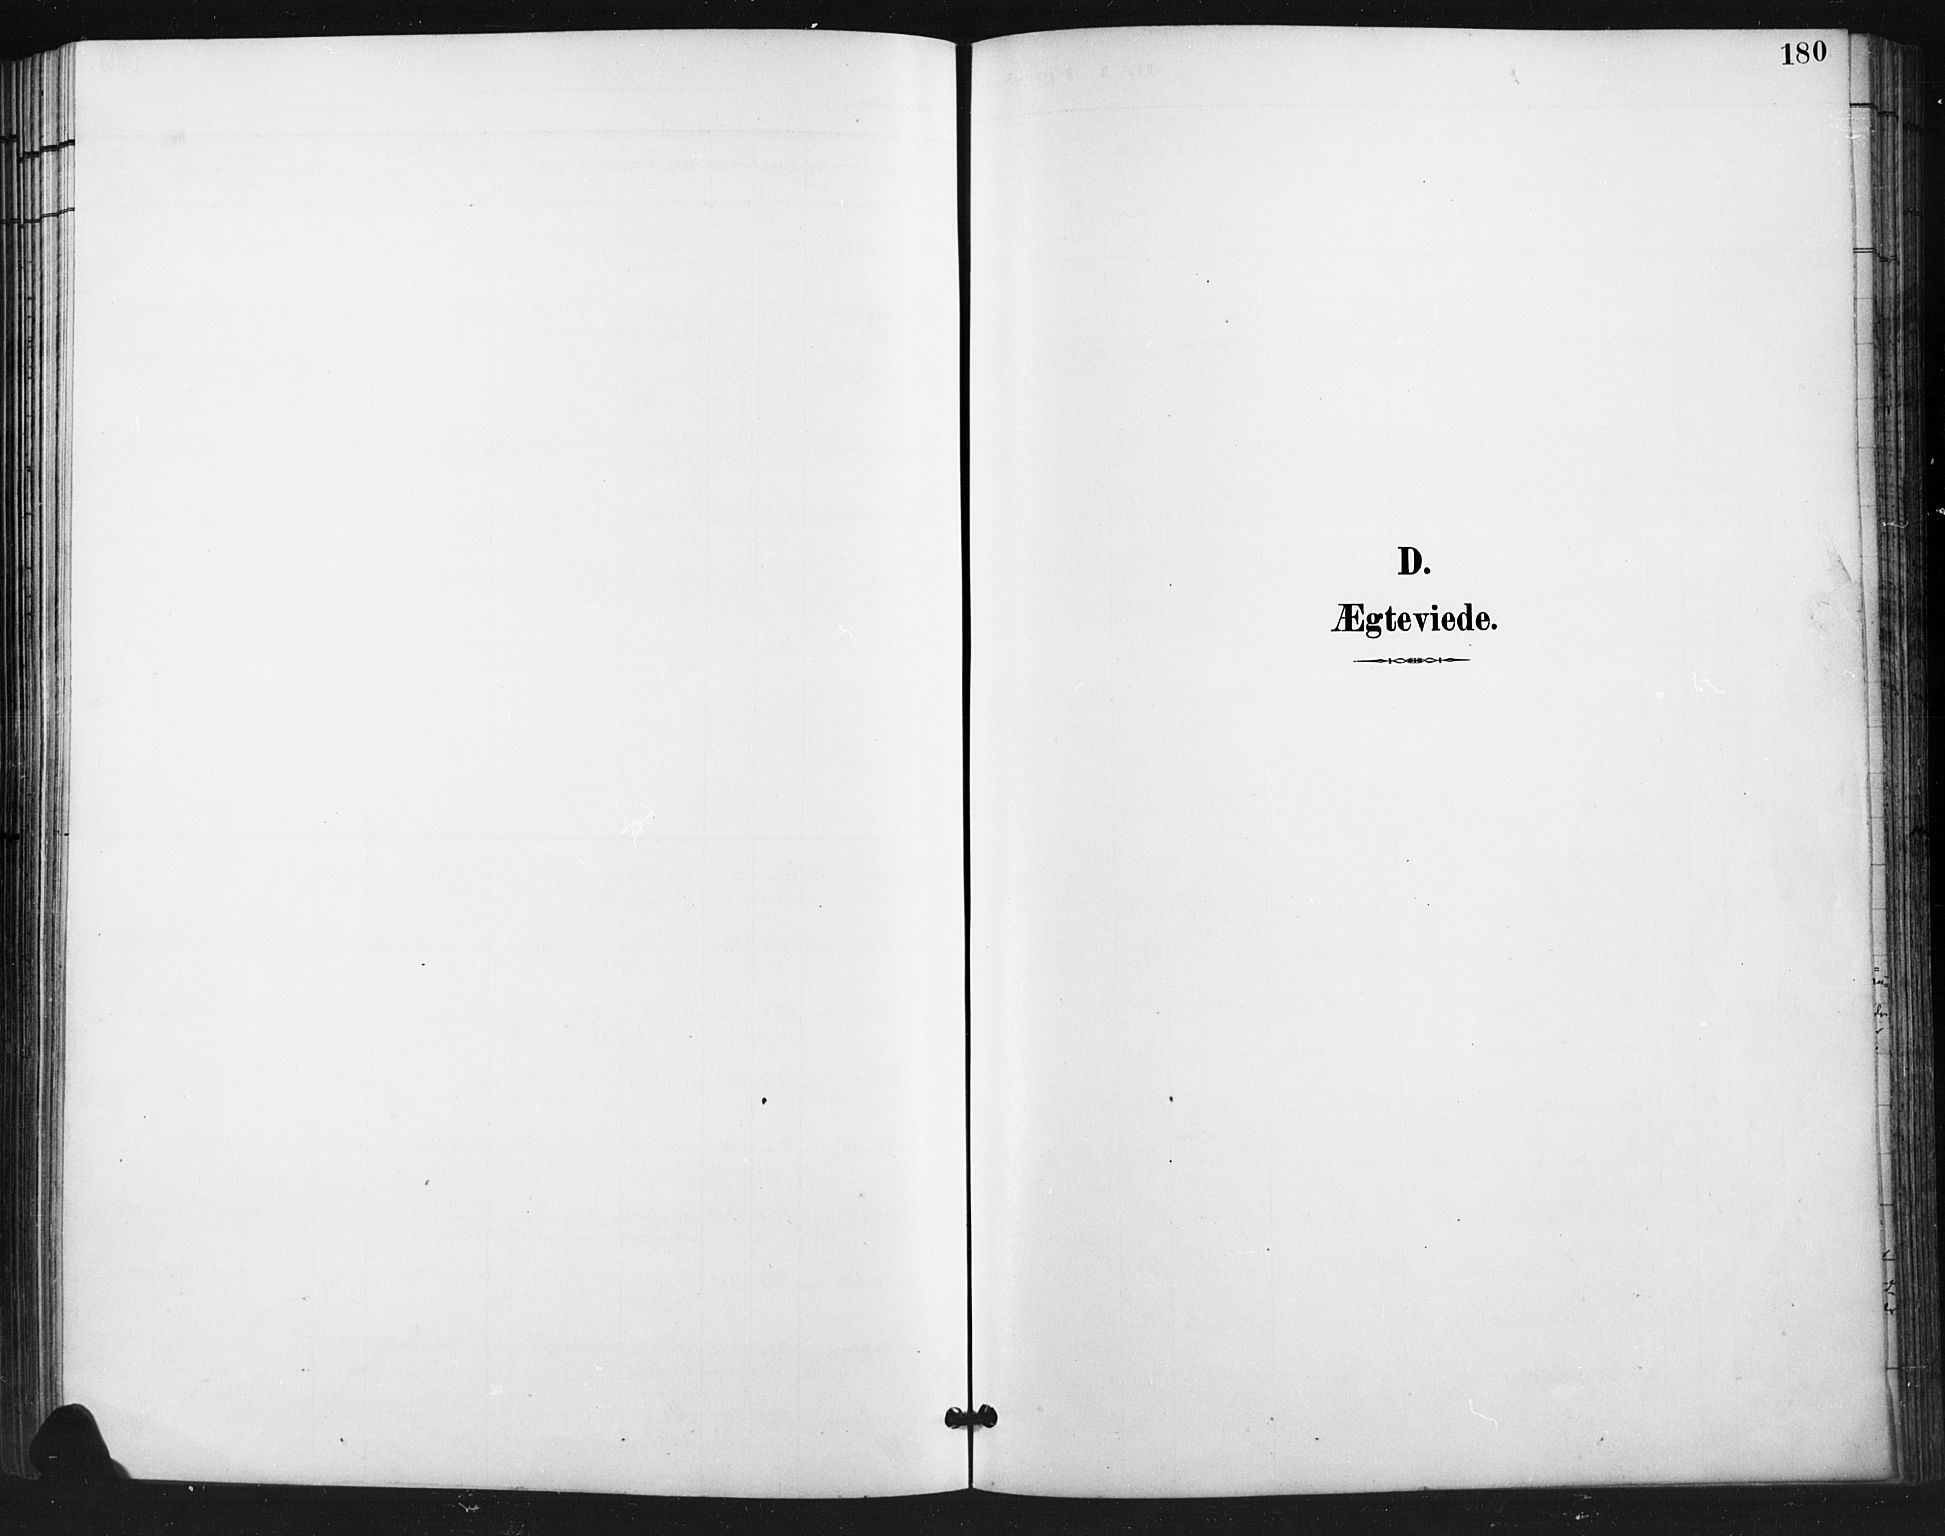 SAH, Vestre Gausdal prestekontor, Klokkerbok nr. 3, 1896-1925, s. 180